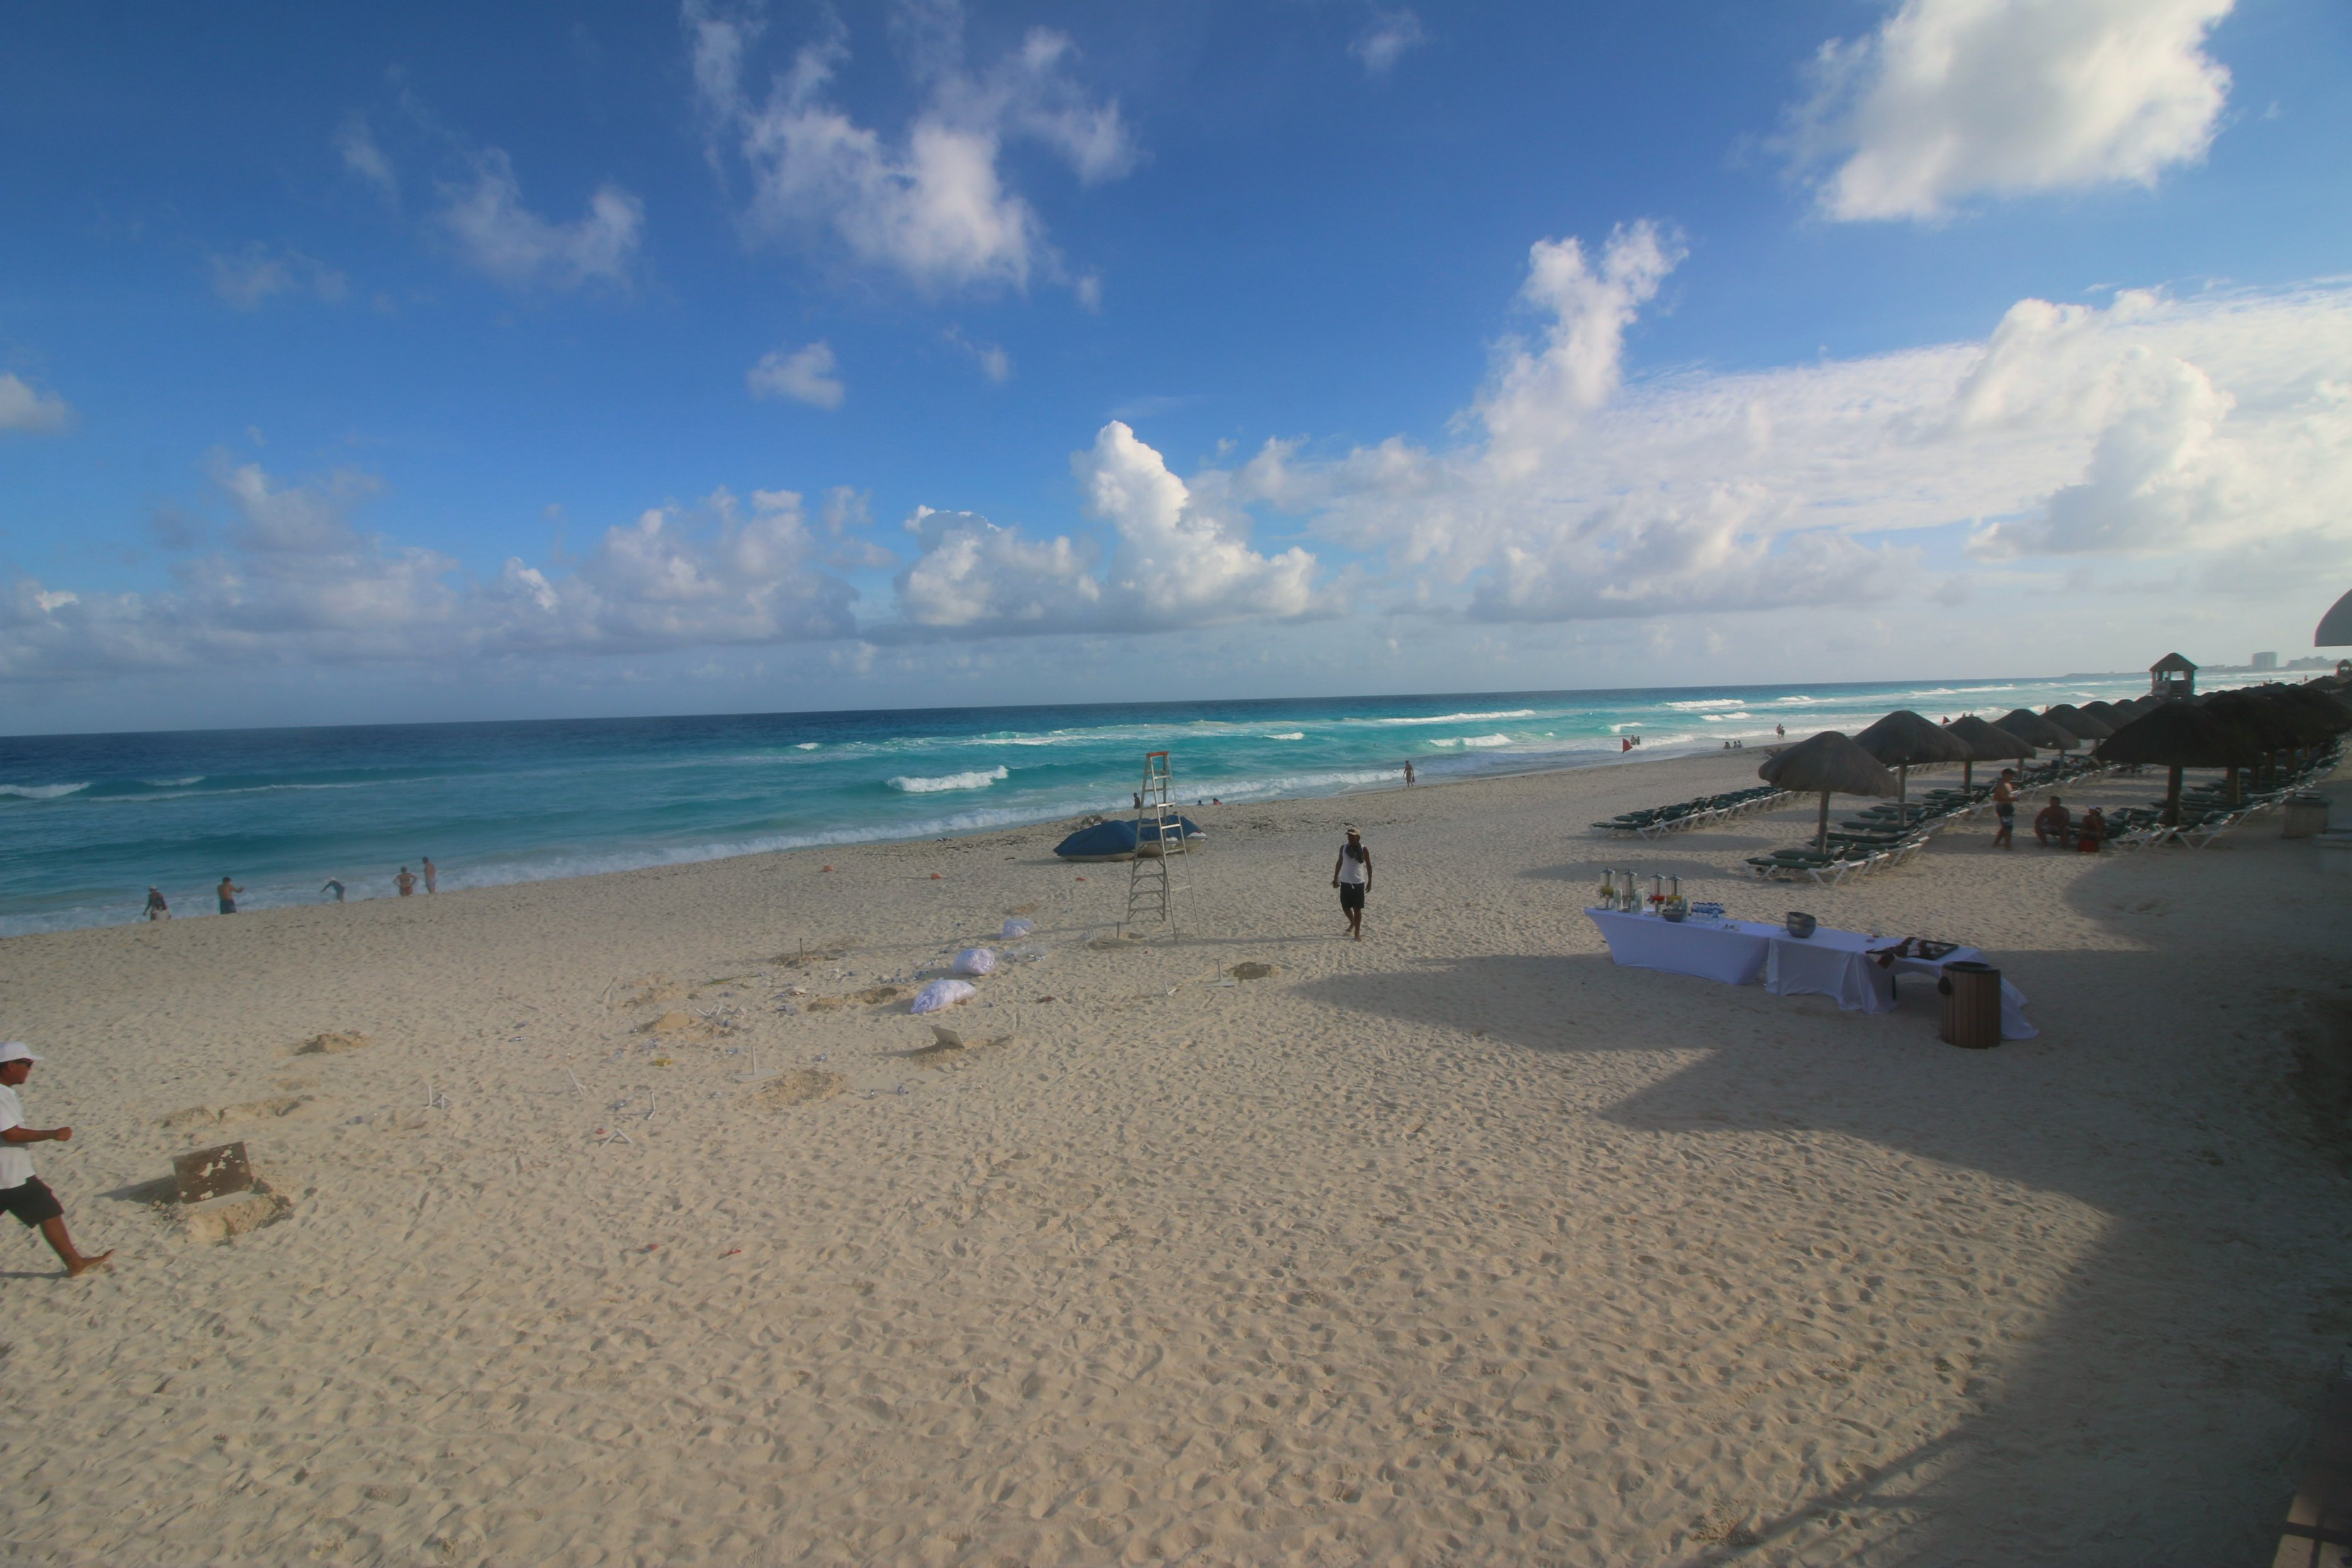 hard-rock-cancun-beach-view